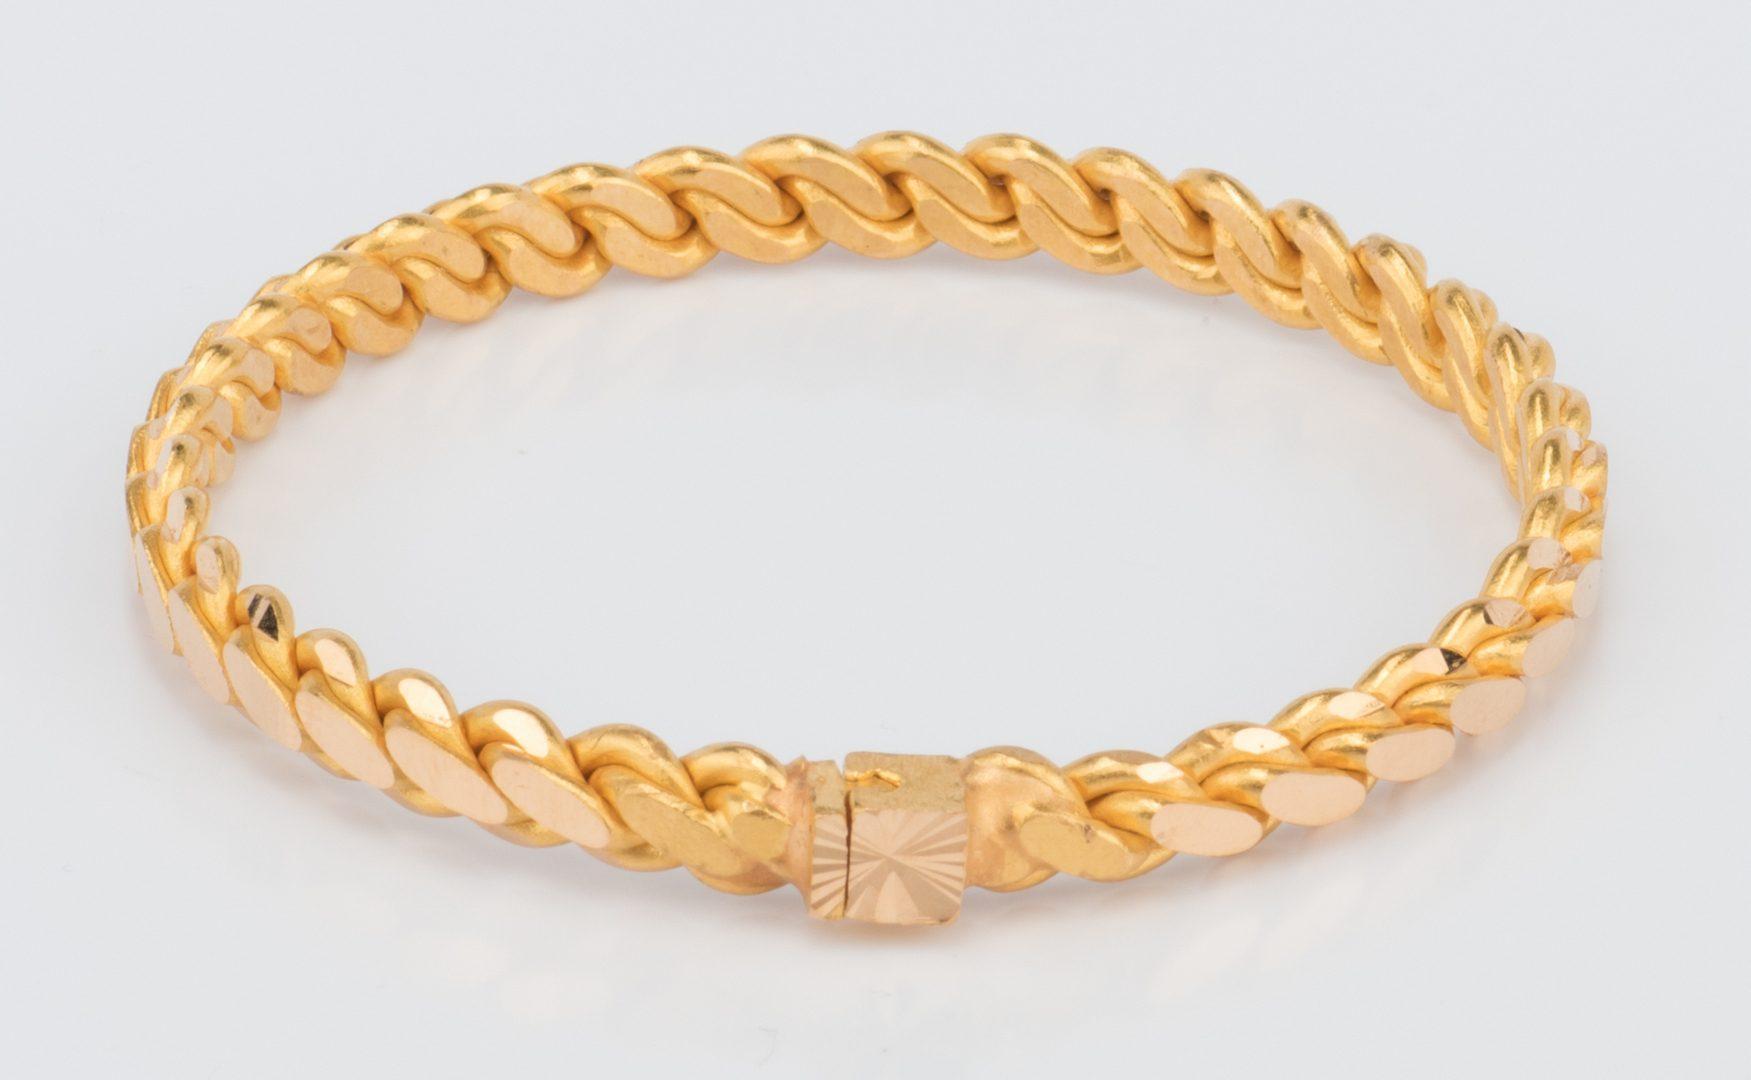 Lot 56: 24 ct Gold Bangle, 50 grams